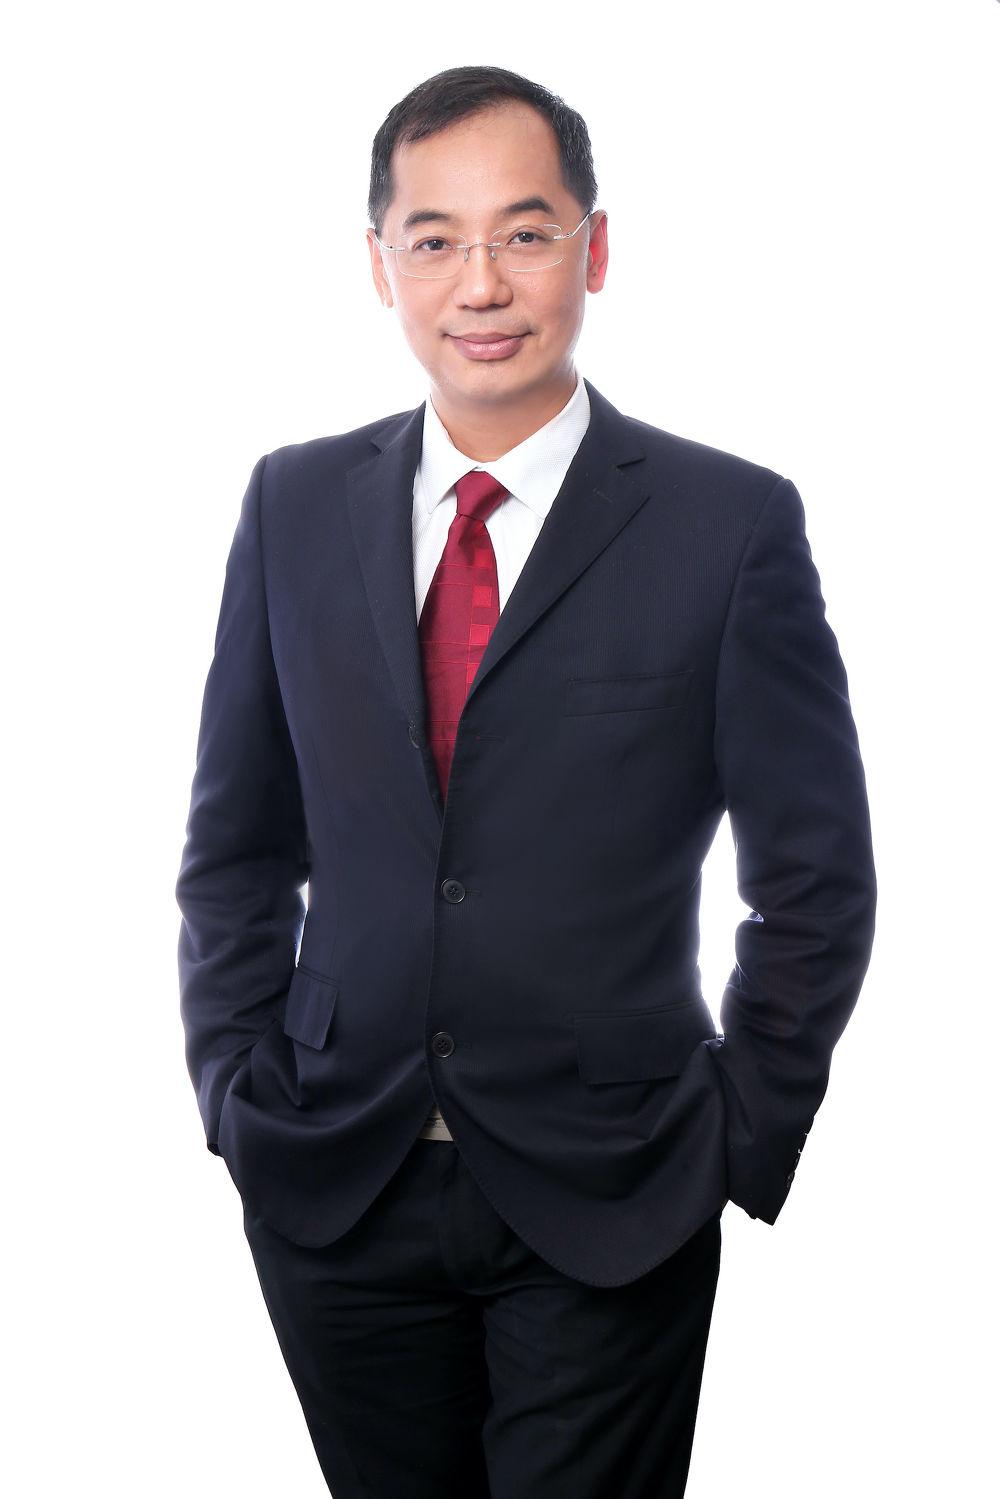 Ho Chee Kit - EDGEPROP SINGAPORE